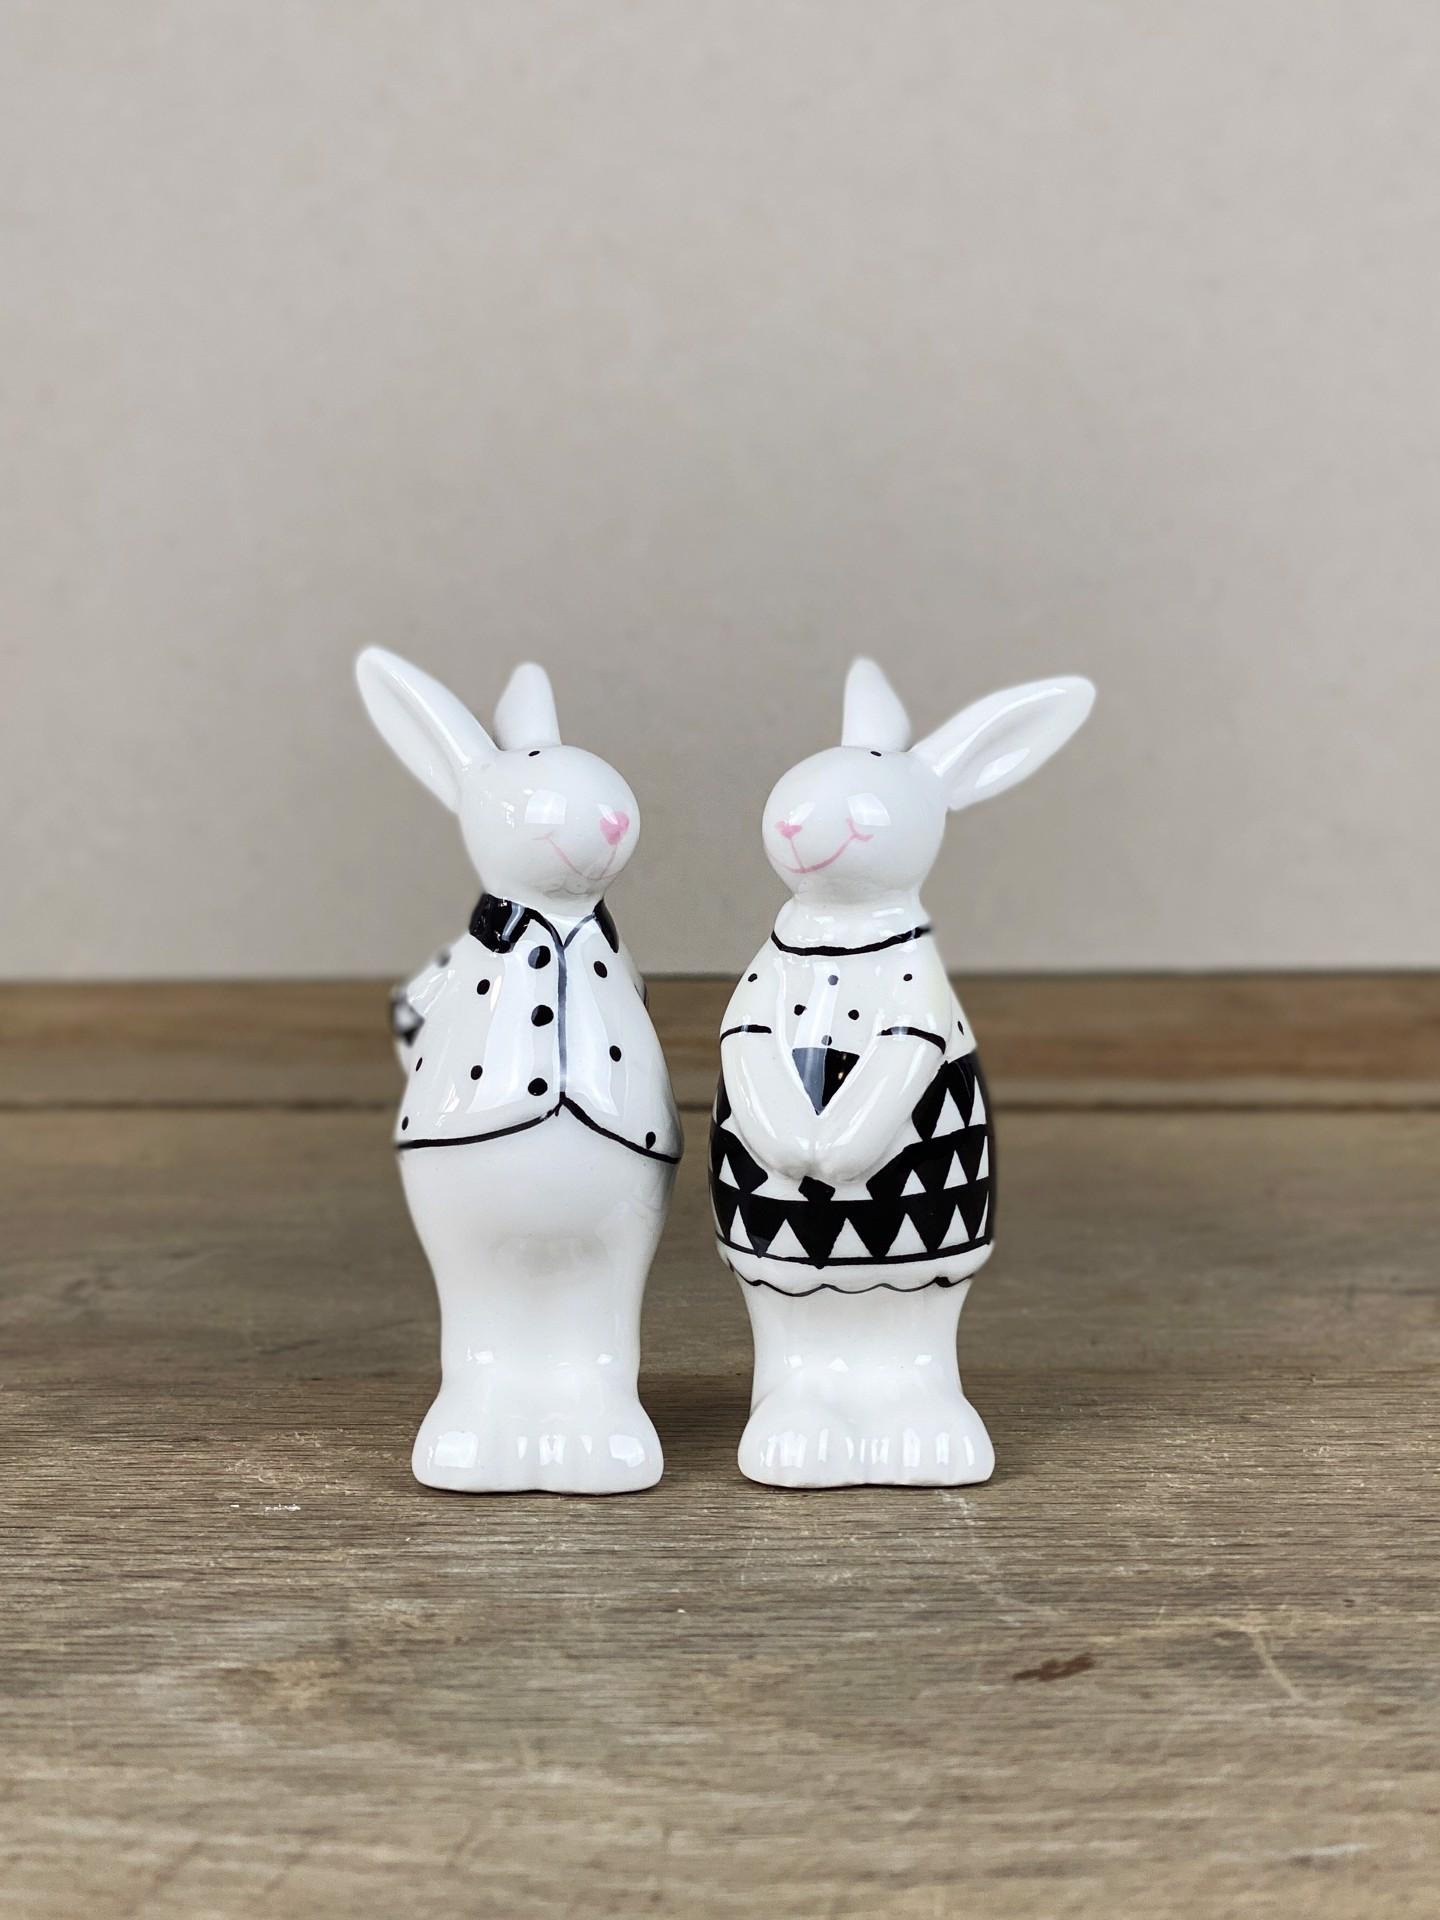 Osterhasen-Pärchen Keramik